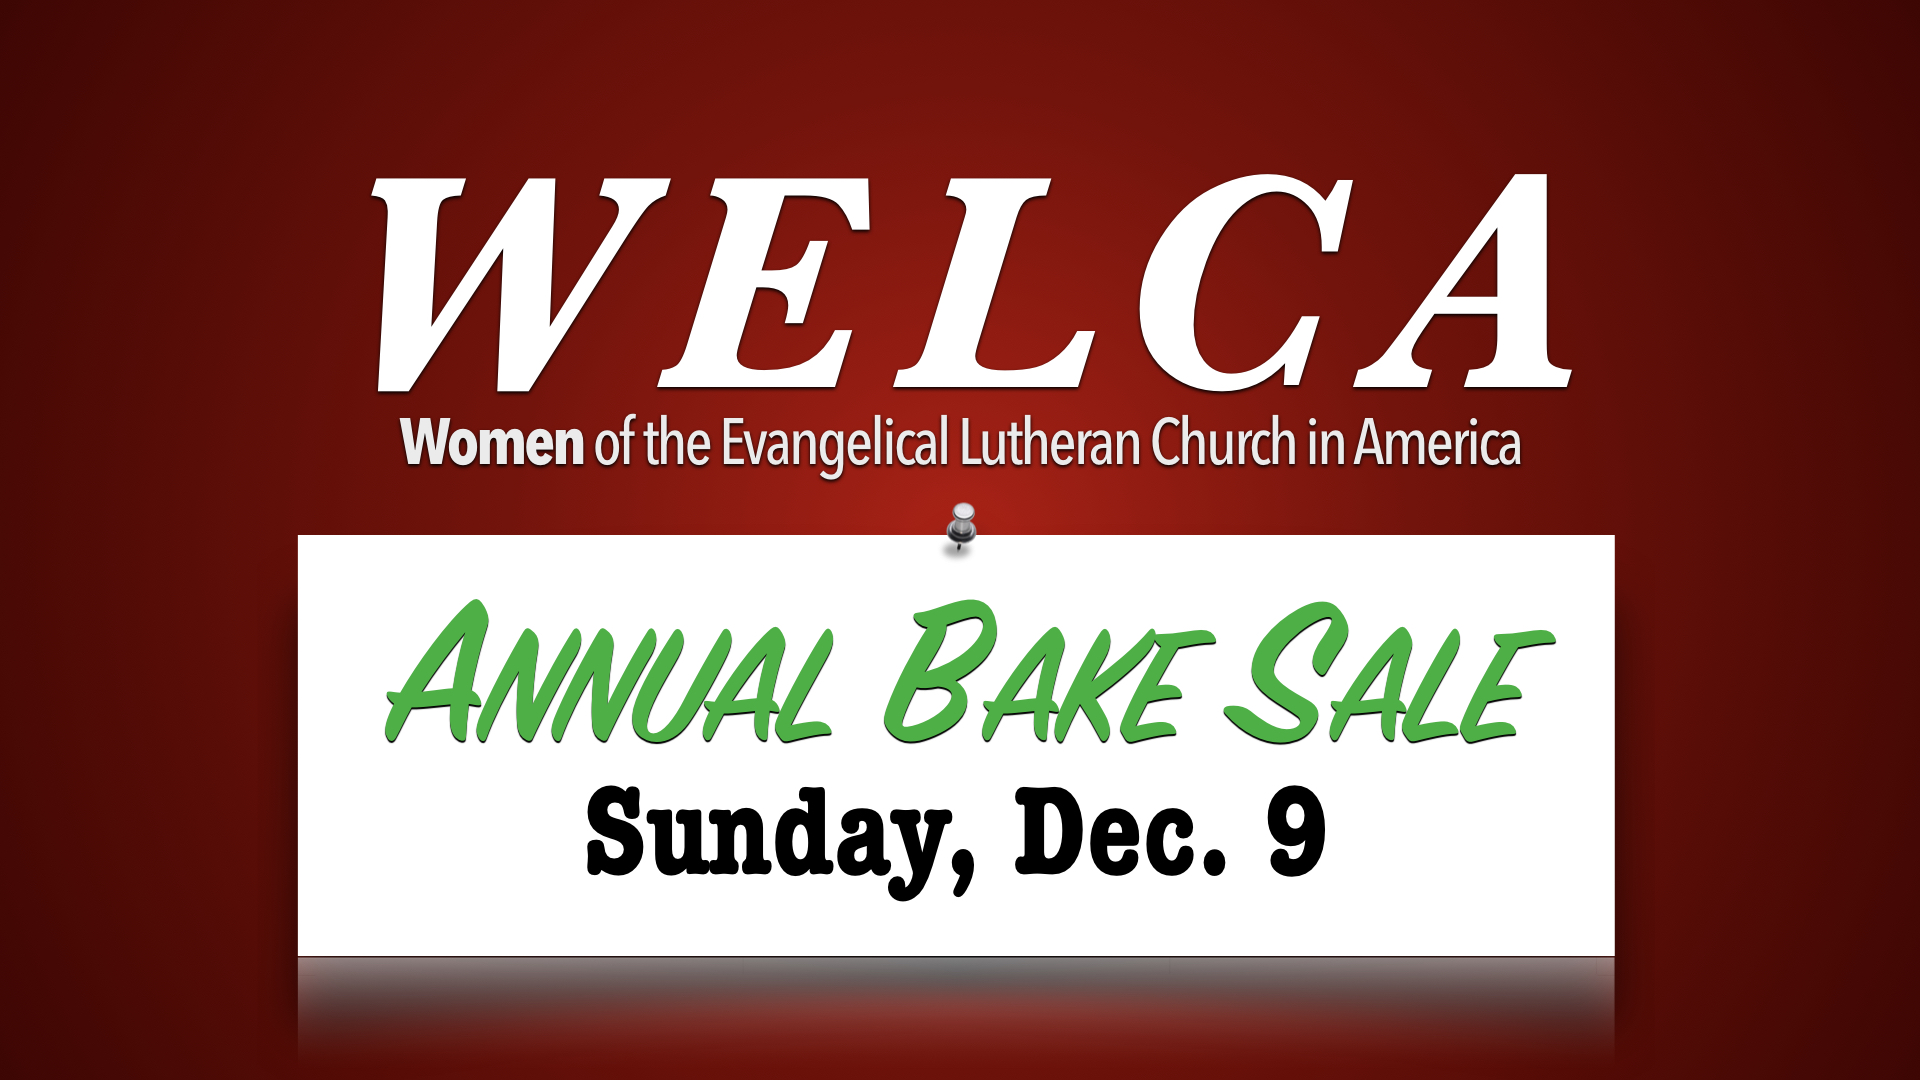 WELCA Annual Bake Sale